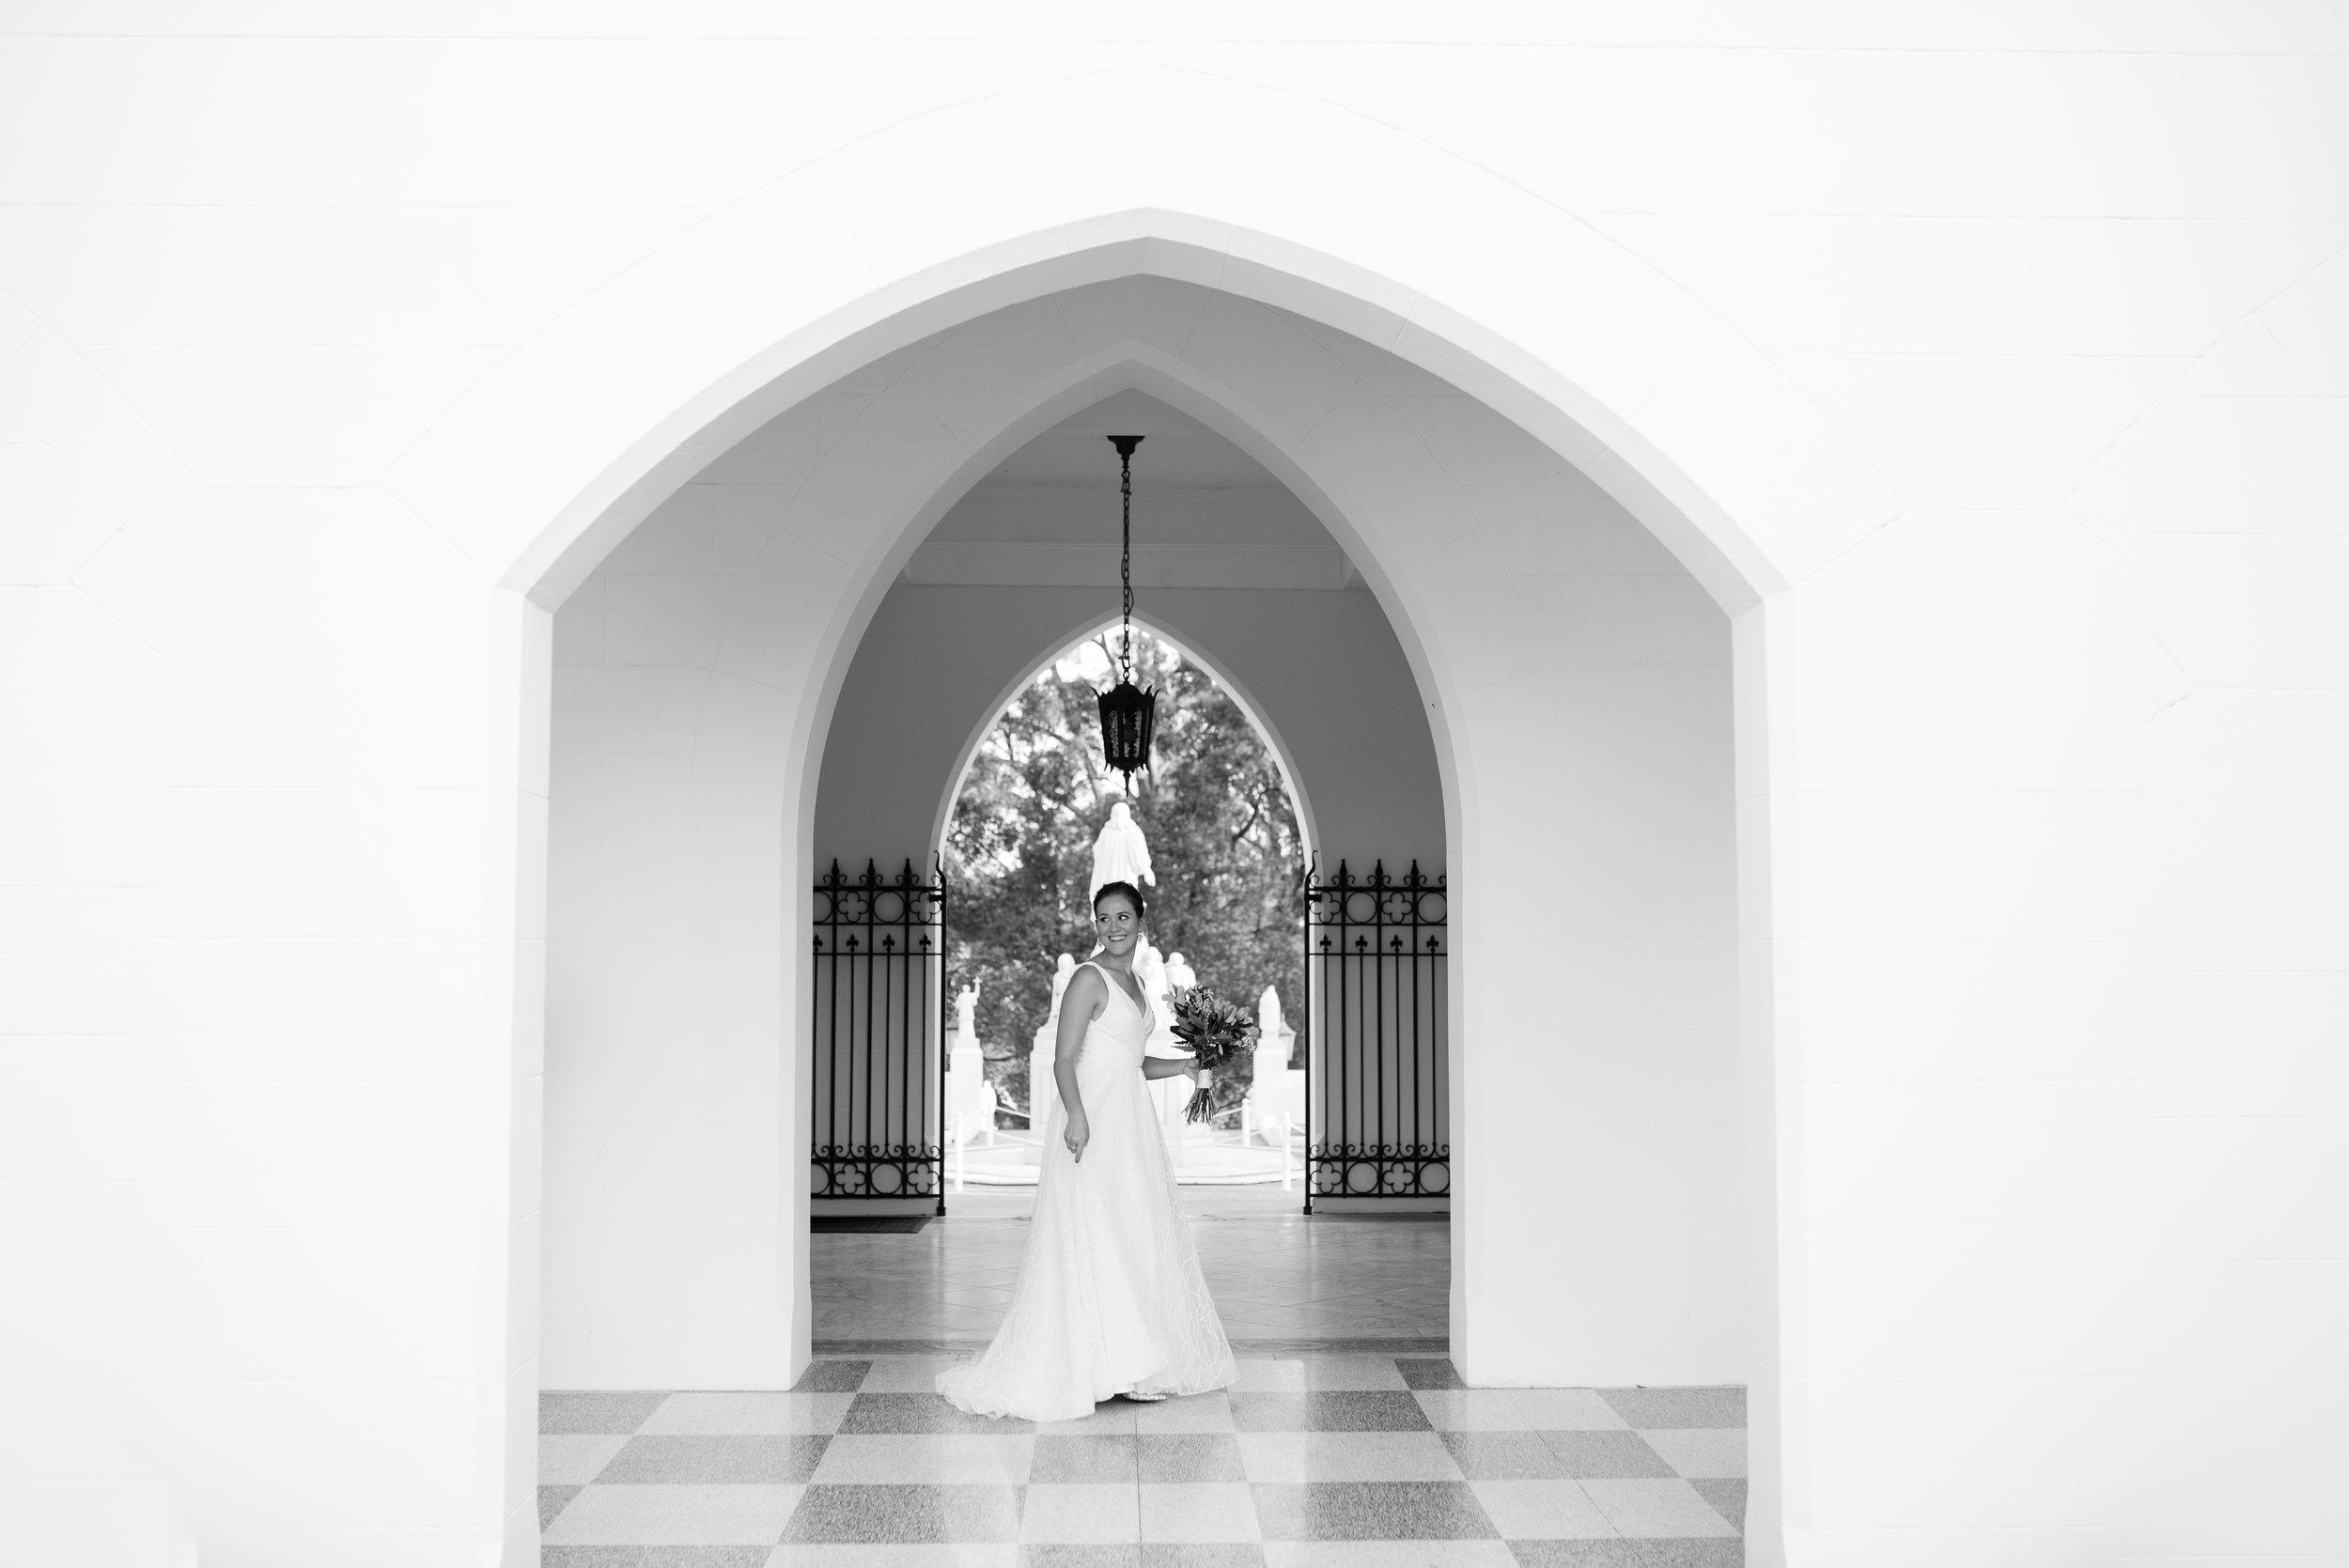 refinery-wedding-brisbane-city-wedding-photographer-64.jpg